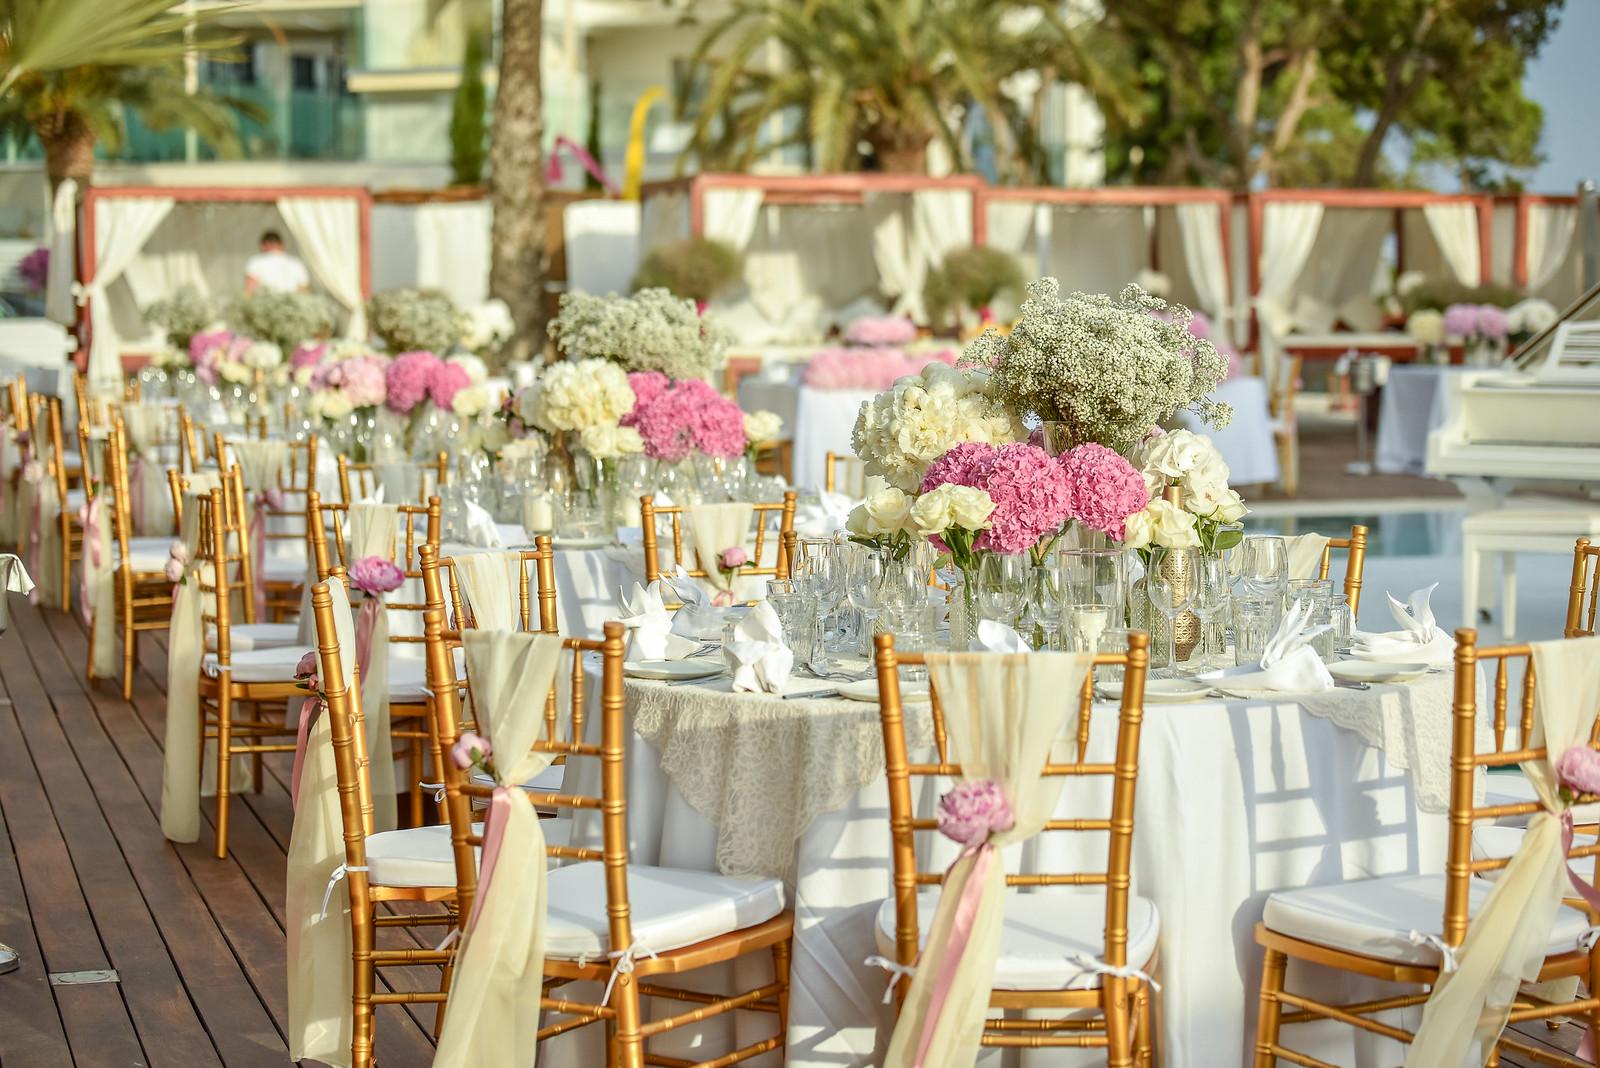 https://www.white-ibiza.com/wp-content/uploads/2020/07/white-ibiza-wedding-venue-nikki-beach-ibiza-2020-05.jpg